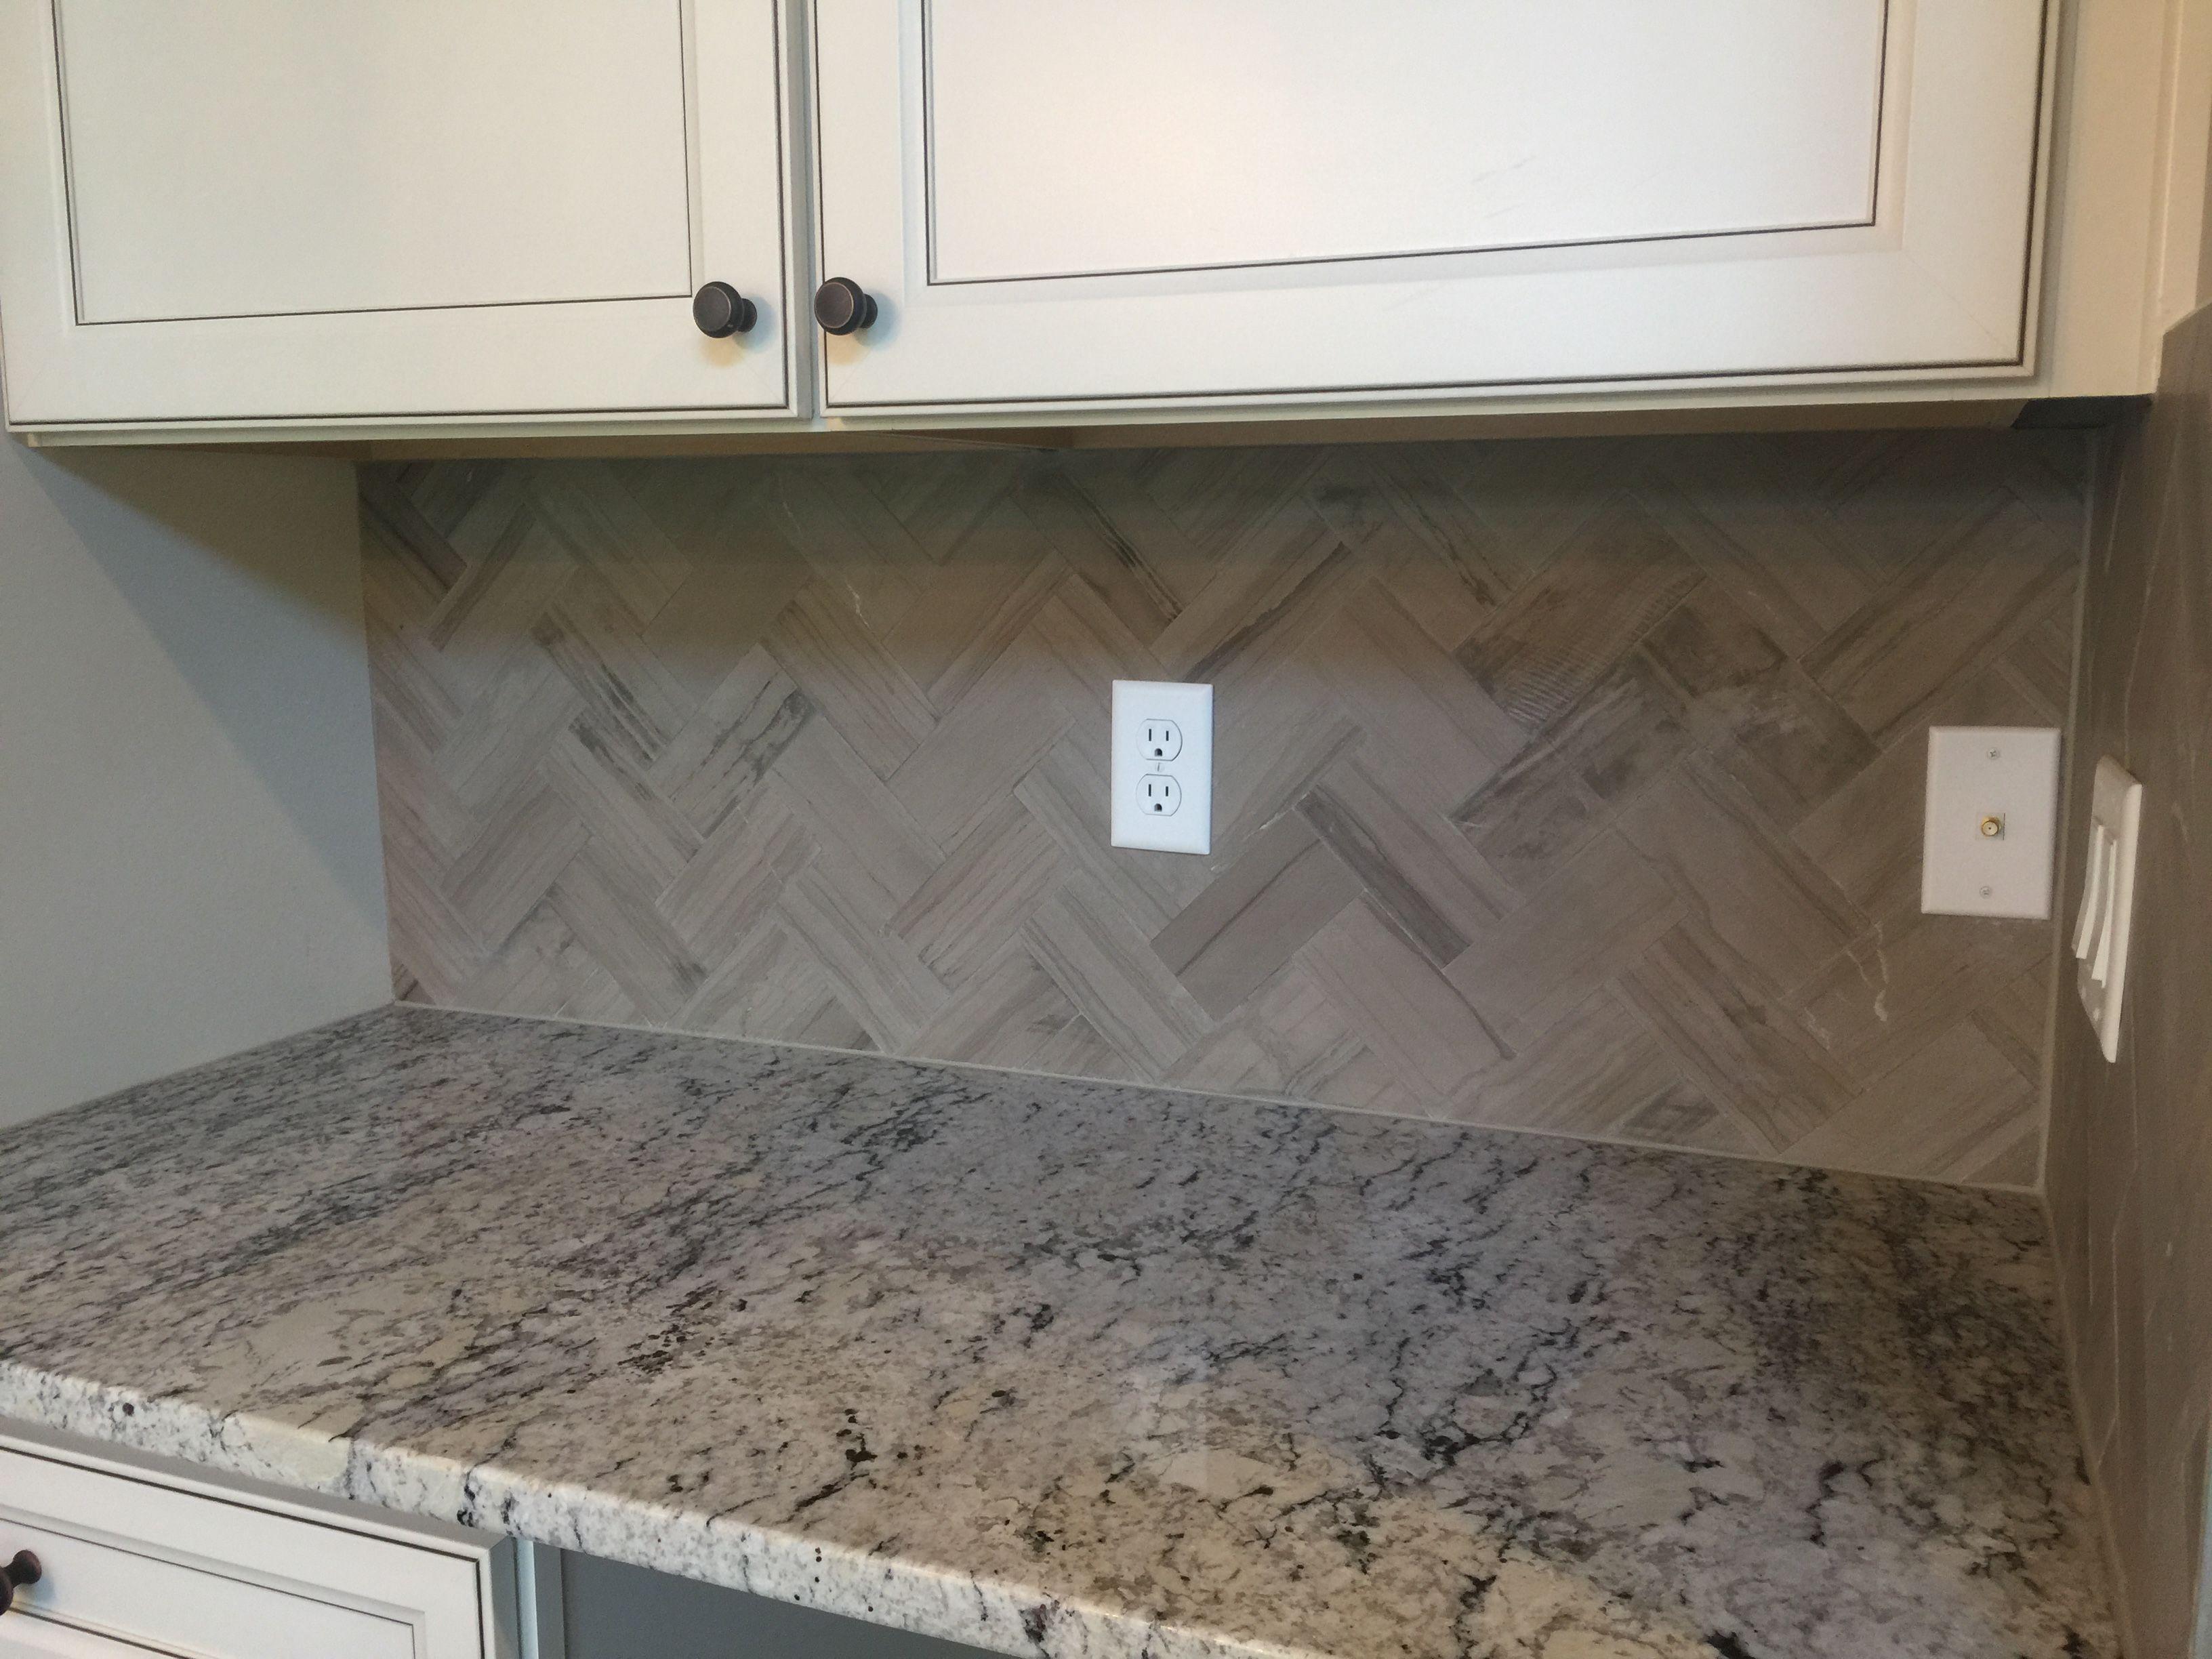 Marble Silver Screen 3x6 Tiles In Herringbone Pattern Kitchen Backsplash Herringbone Pattern Flooring